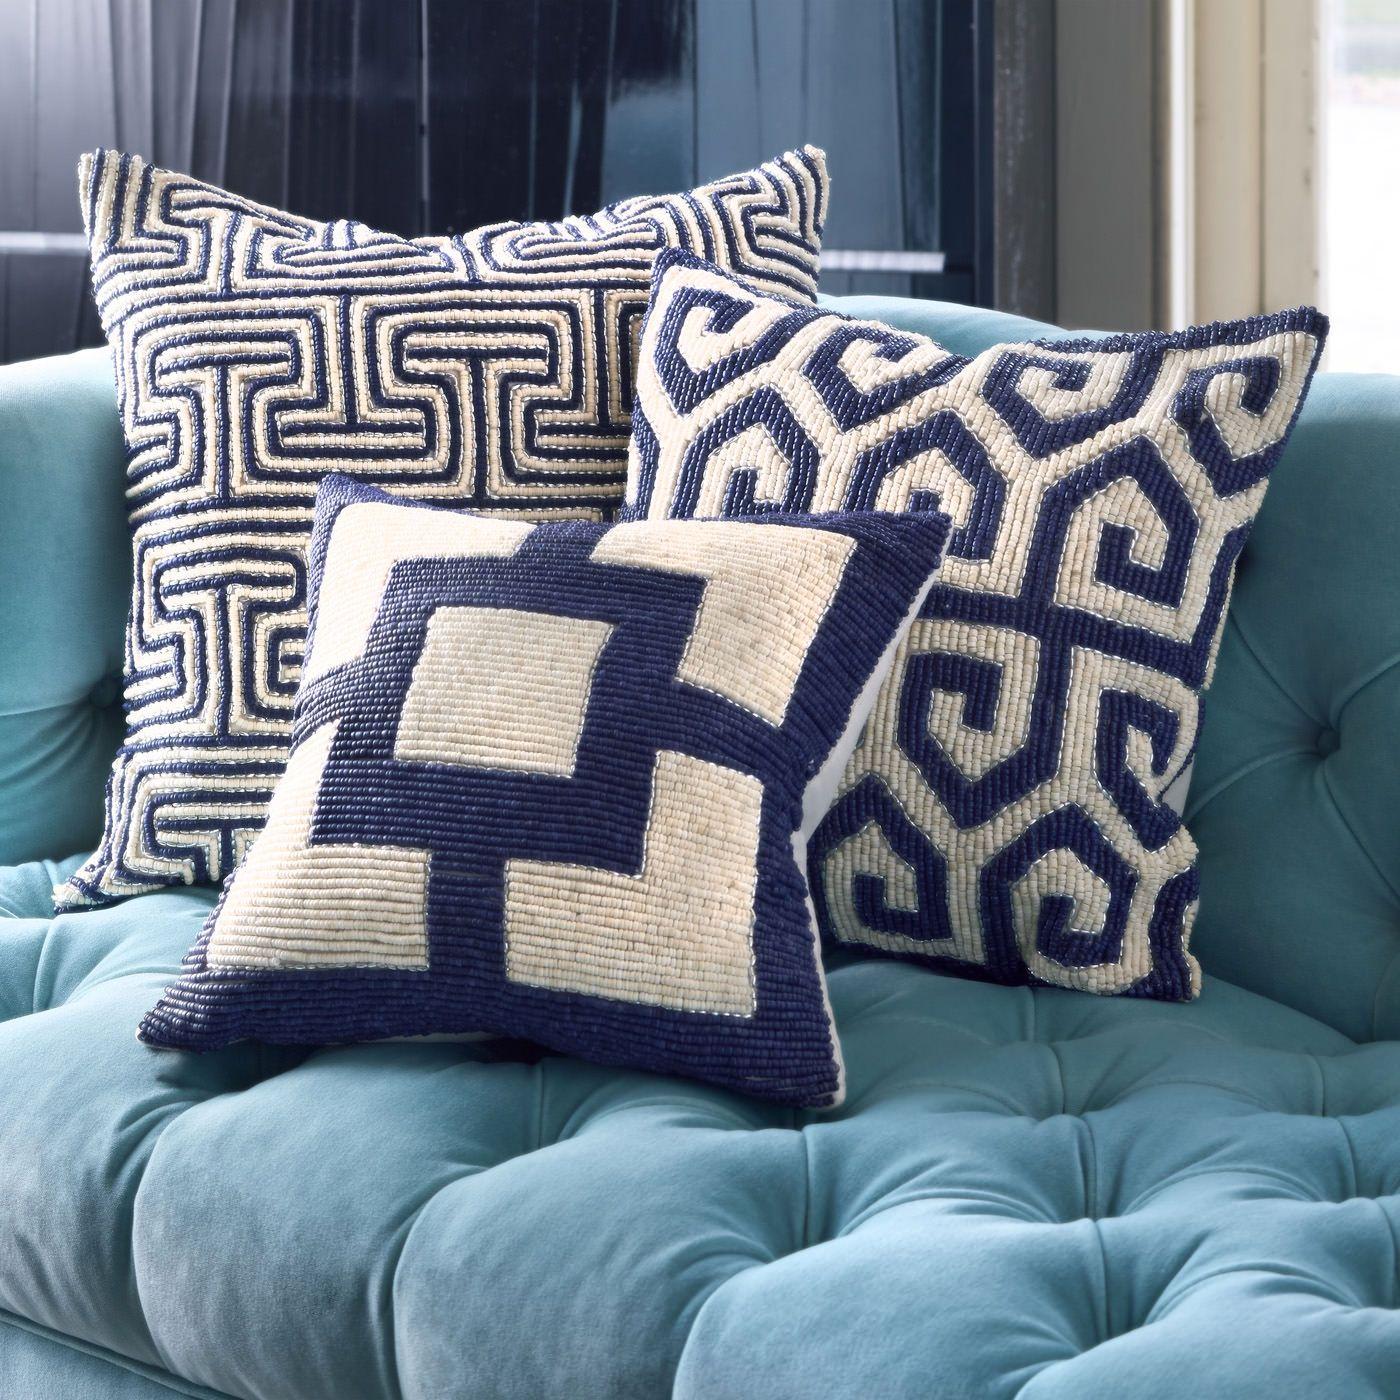 Luxury Sofa Throw Pillows Good Bed Toronto Designer Trend For 35